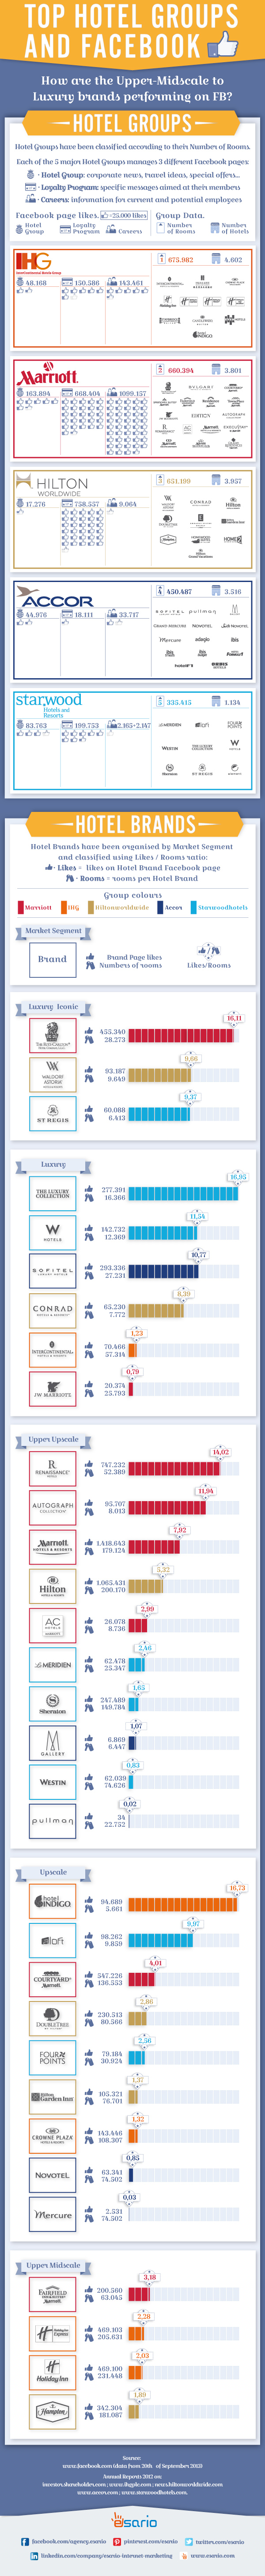 top-hotel-groups--facebook-infographic_5256af4aeb92c